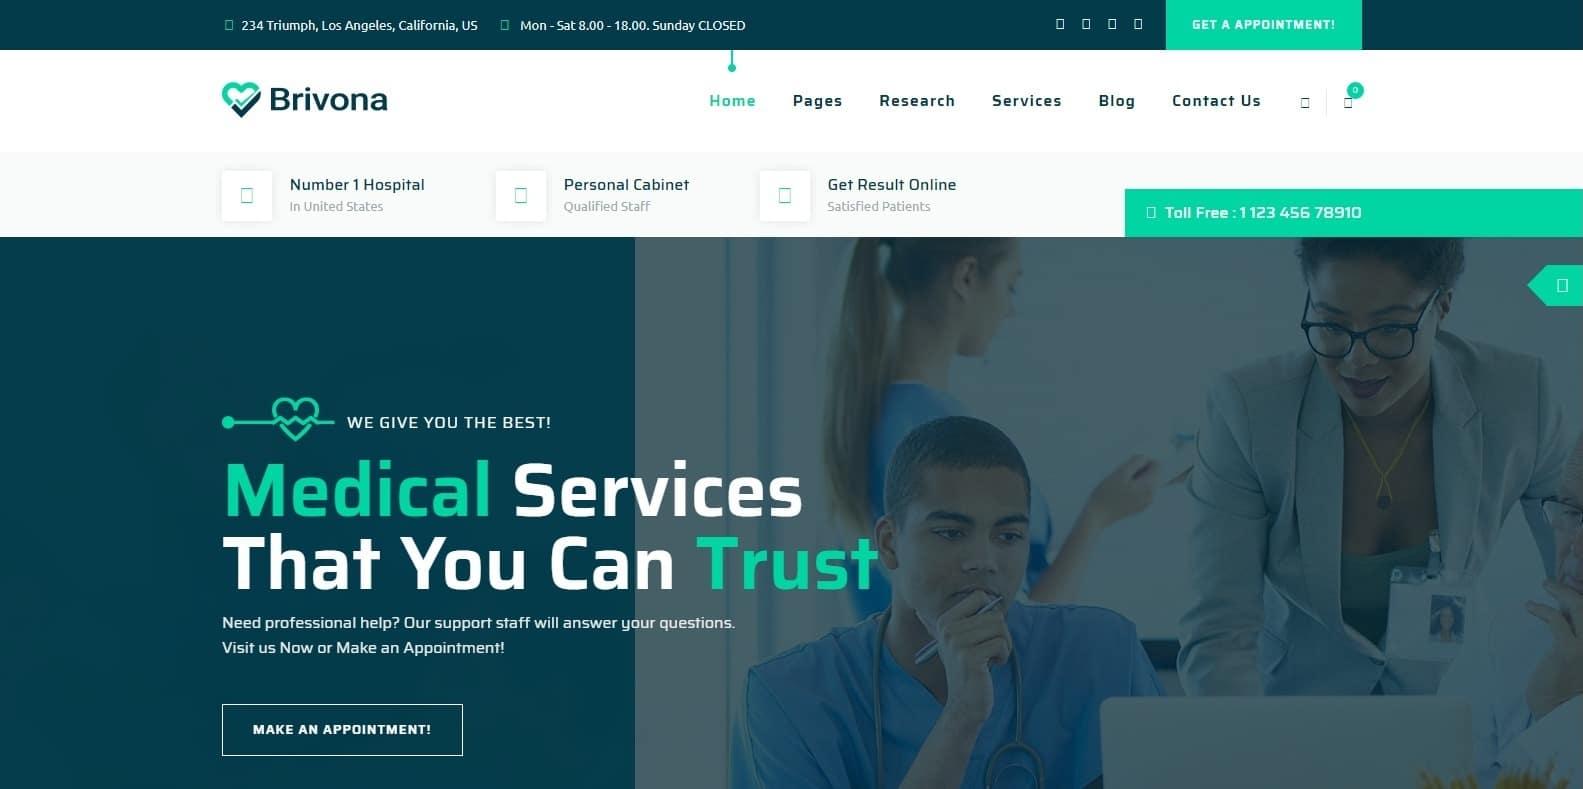 brivona-medical-website-template